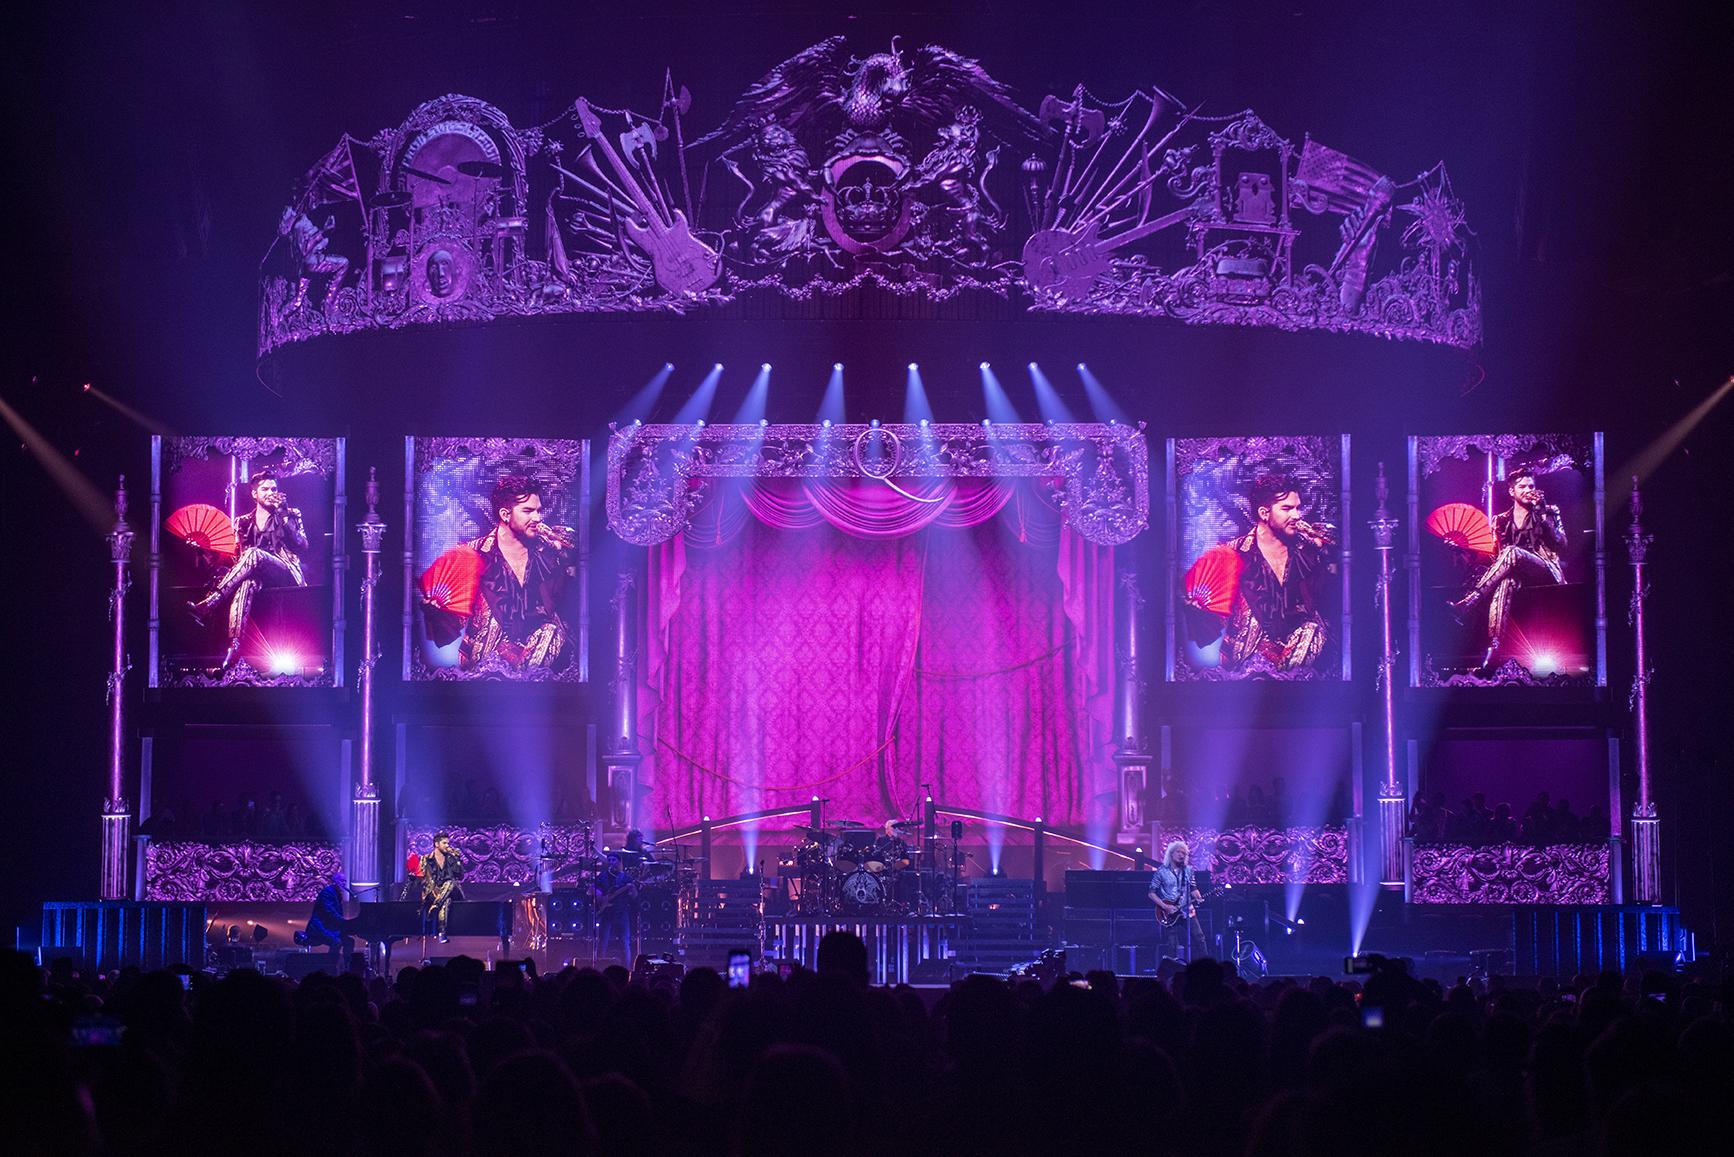 stage design and lighting design for Queen + Adam Lambert Tour